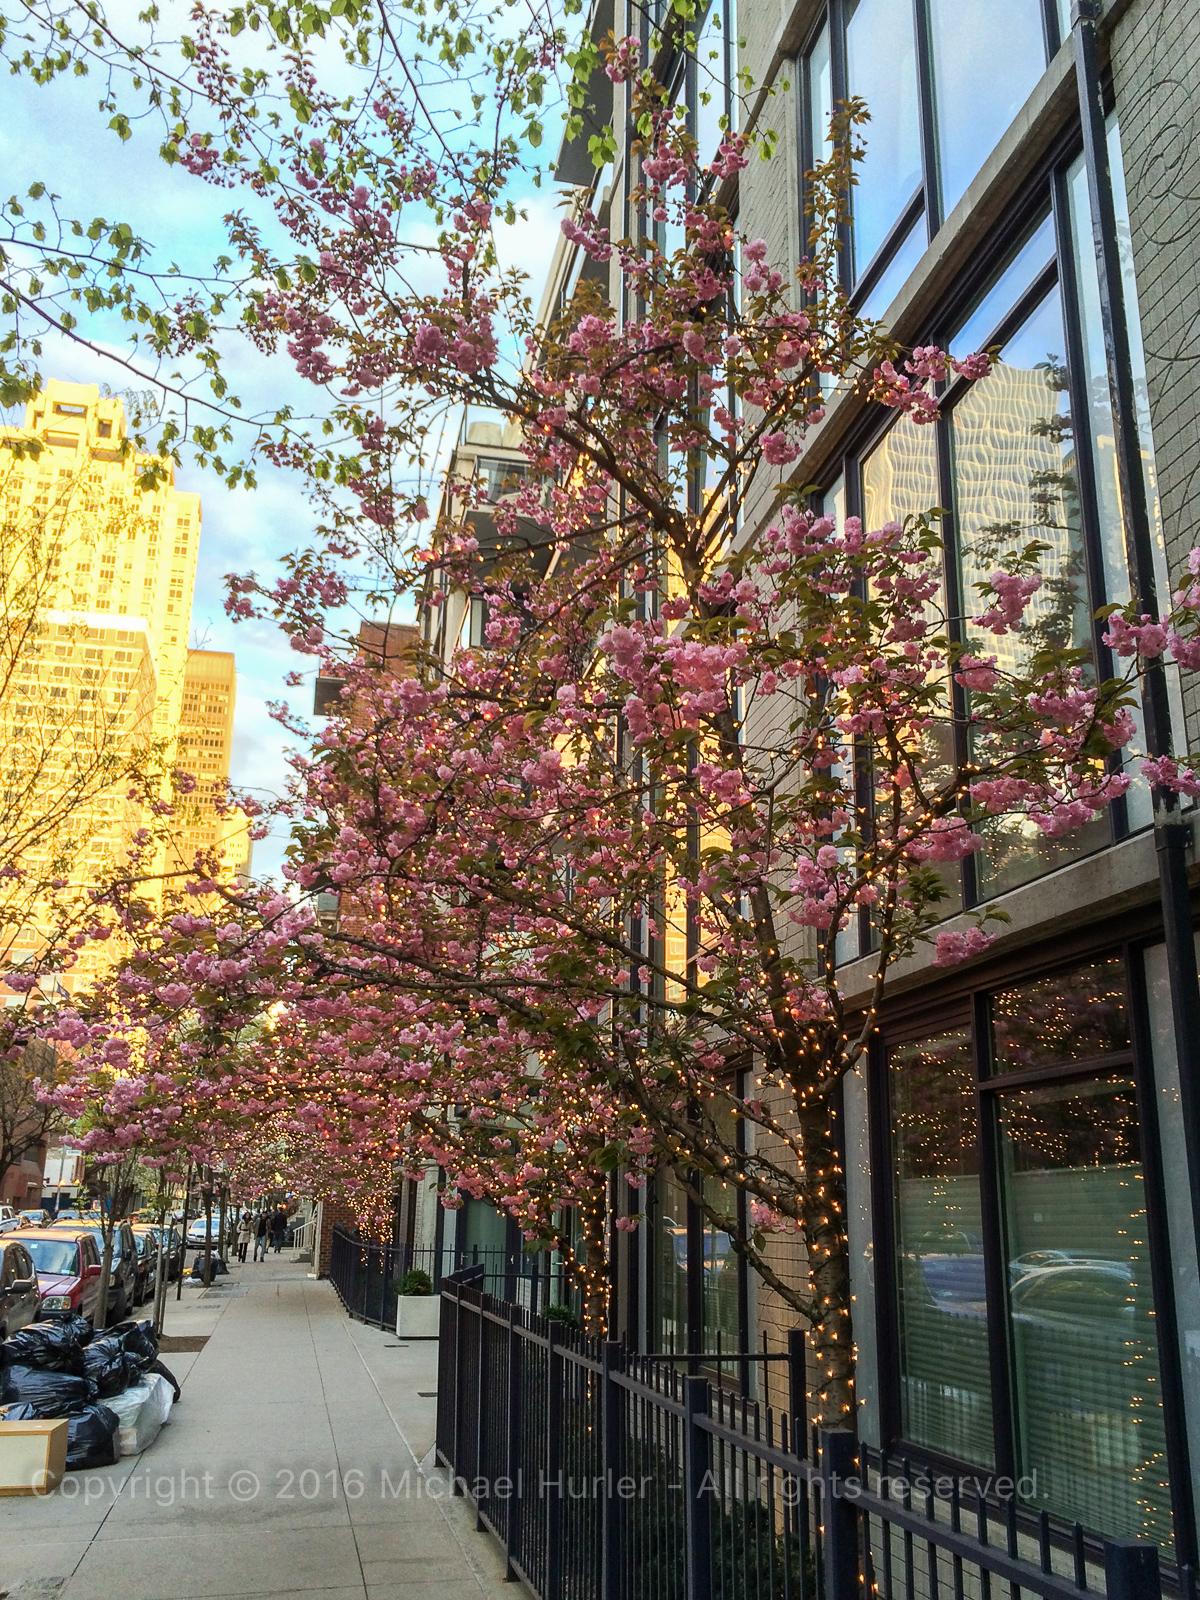 26.04.2015, New York